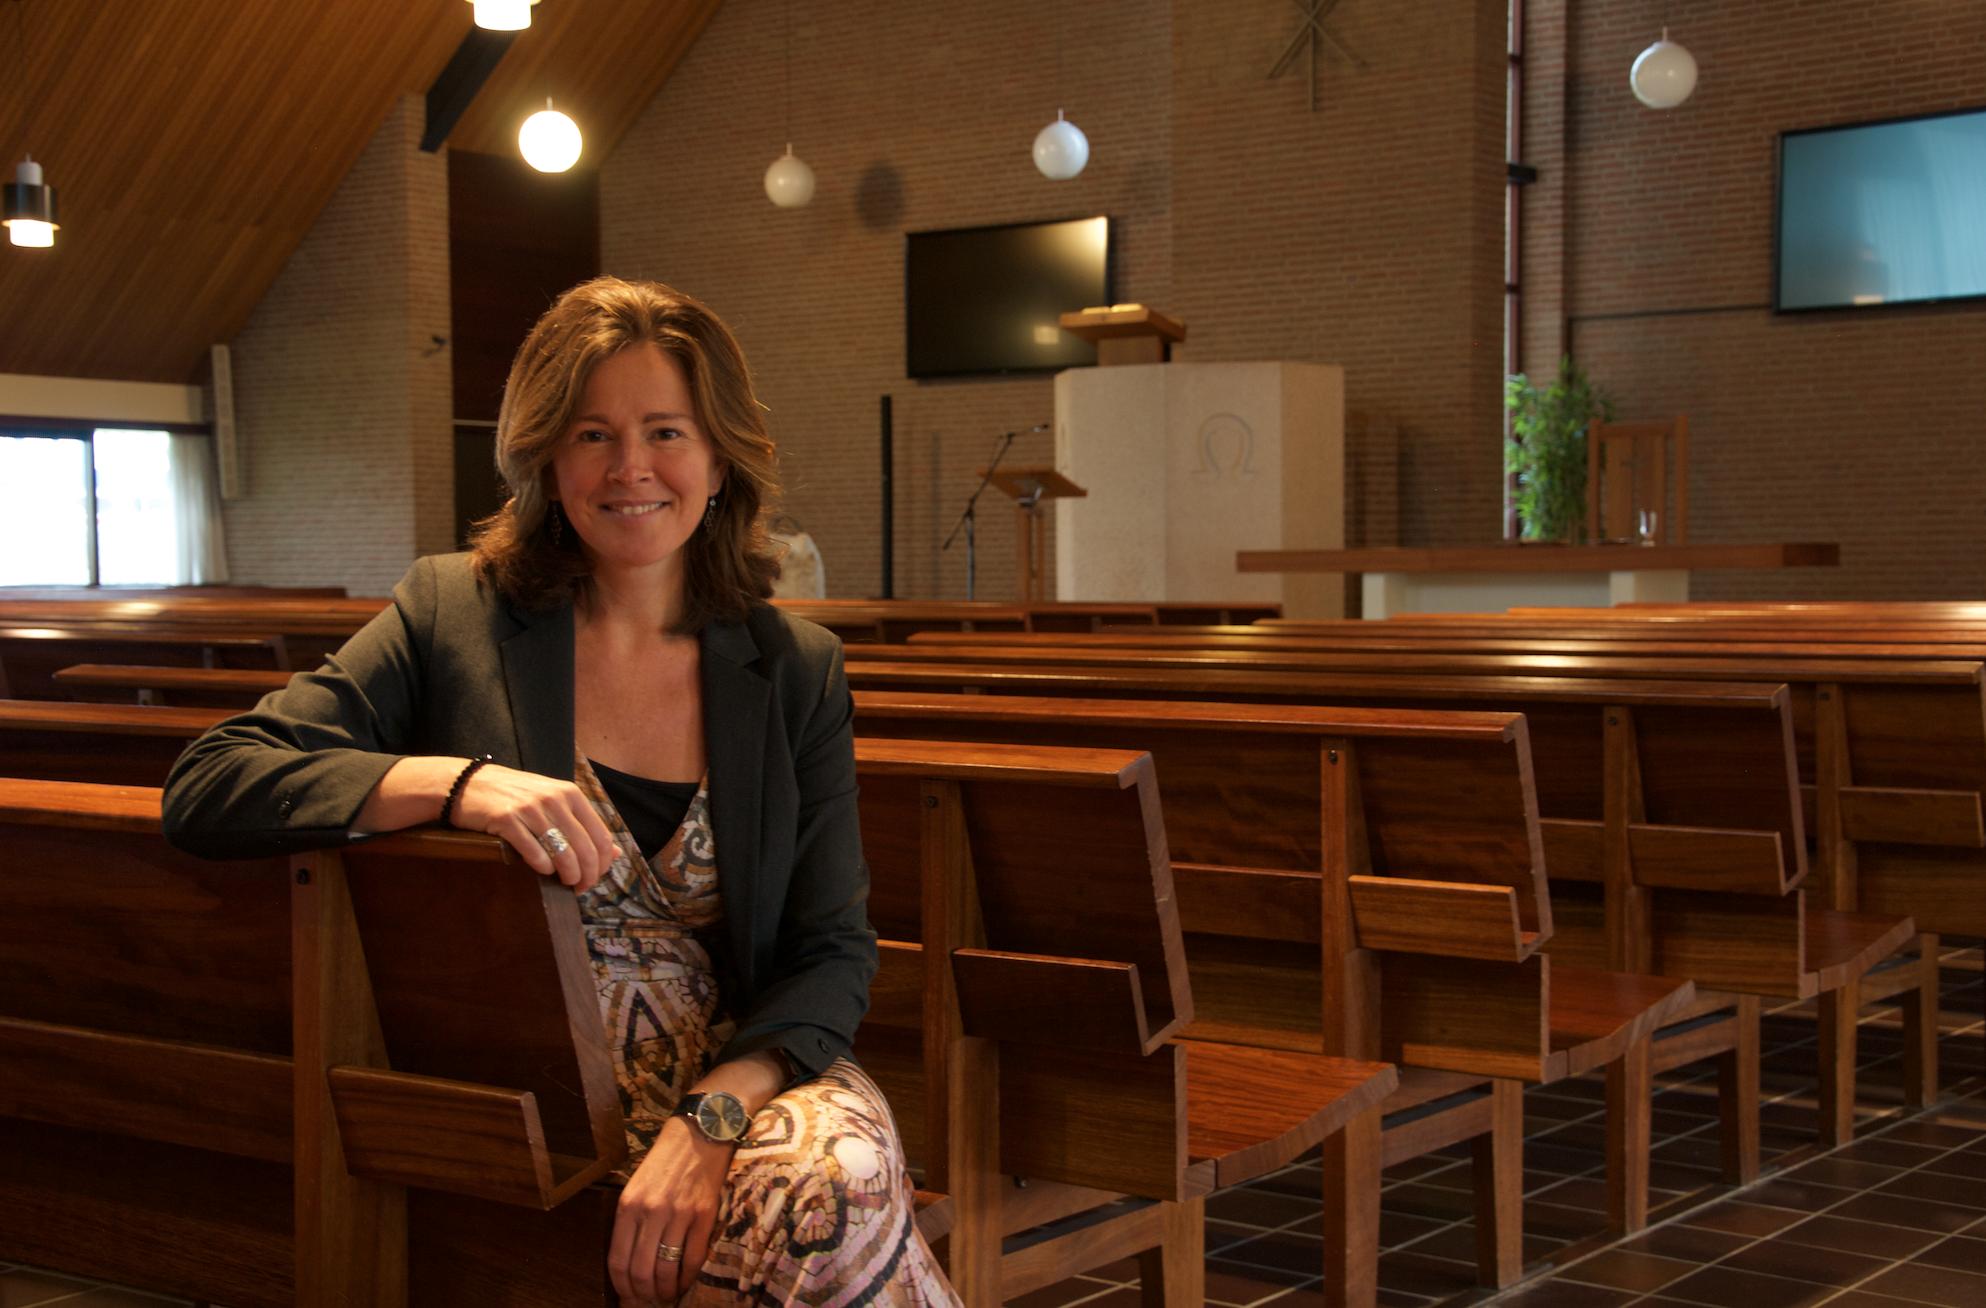 paulien vervoorn interview baptisten achtergrond